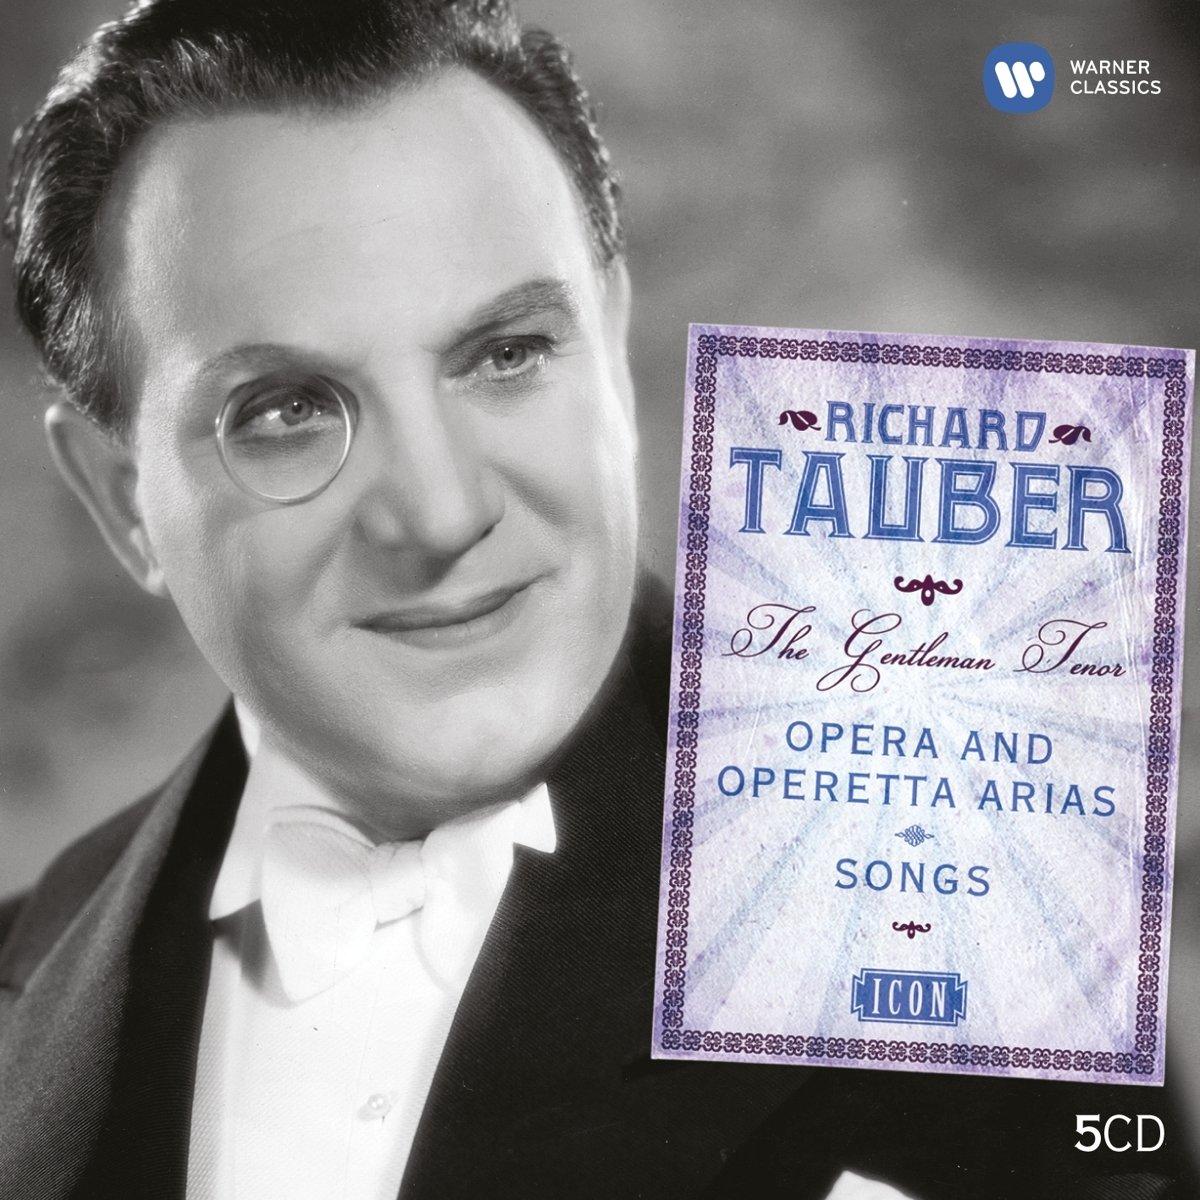 The Gentleman Tenor Opera and Operetta Arias - Richard Tauber, Set 5CD